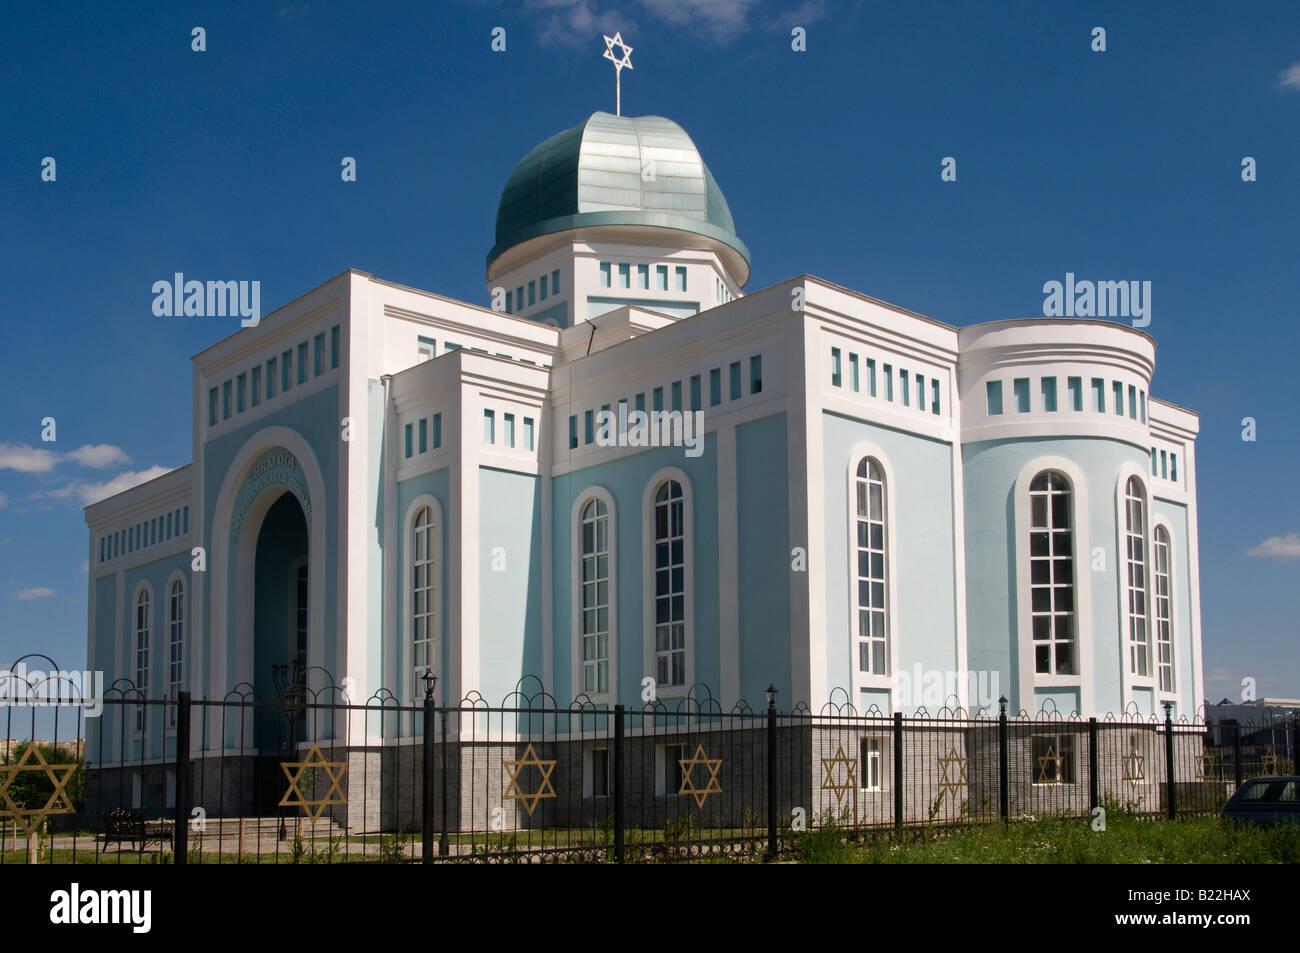 Exterior view of the Jewish synagogue 'Beit Rachel' in Astana capital of Kazakhstan - Stock Image